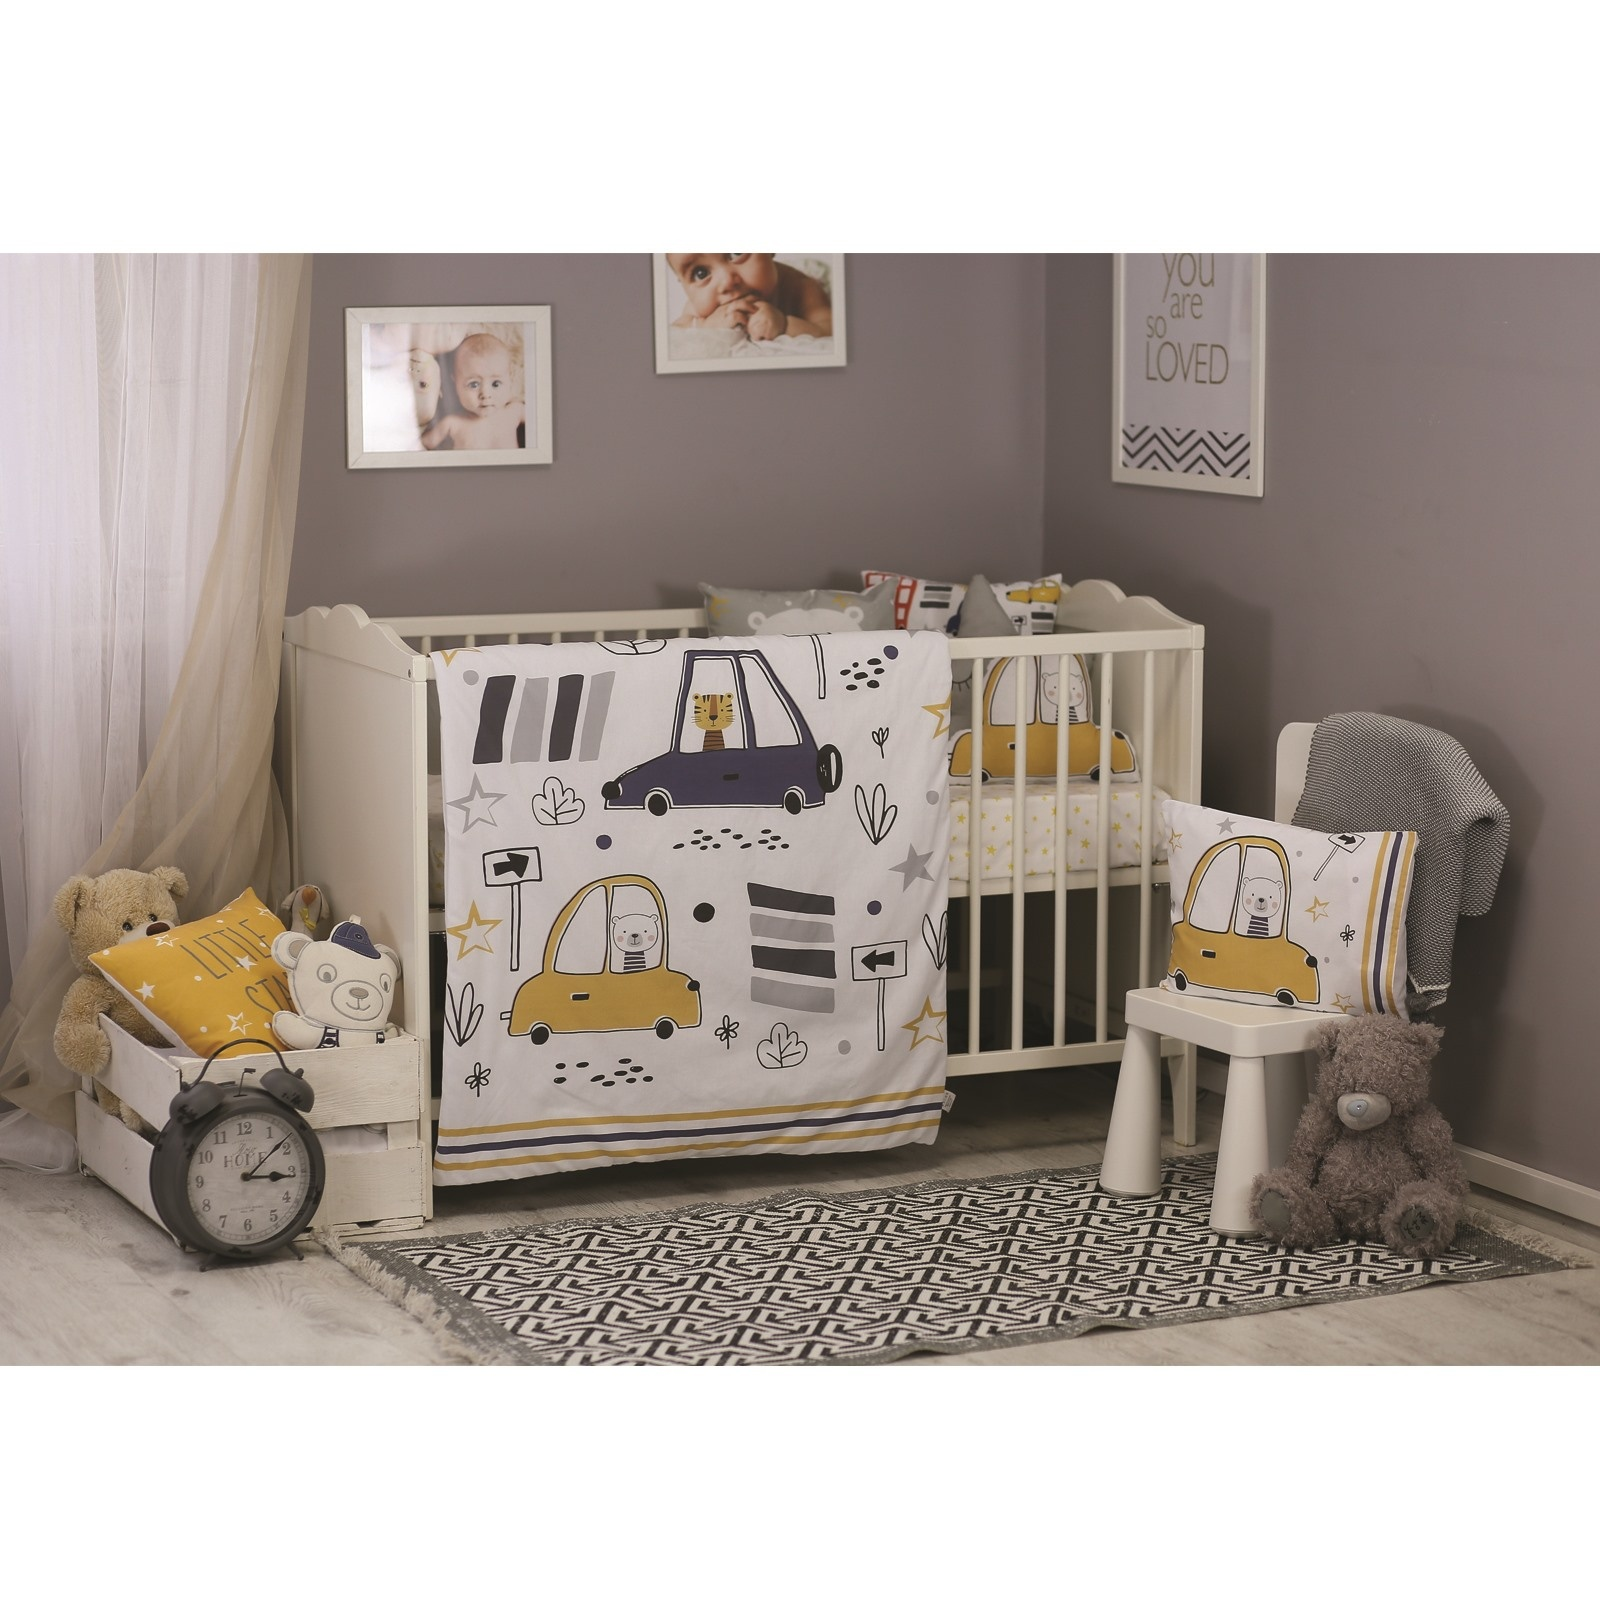 Ebebek Apolena Baby Cars Travel Cot Bed Sleep Cover 5 Pcs Set